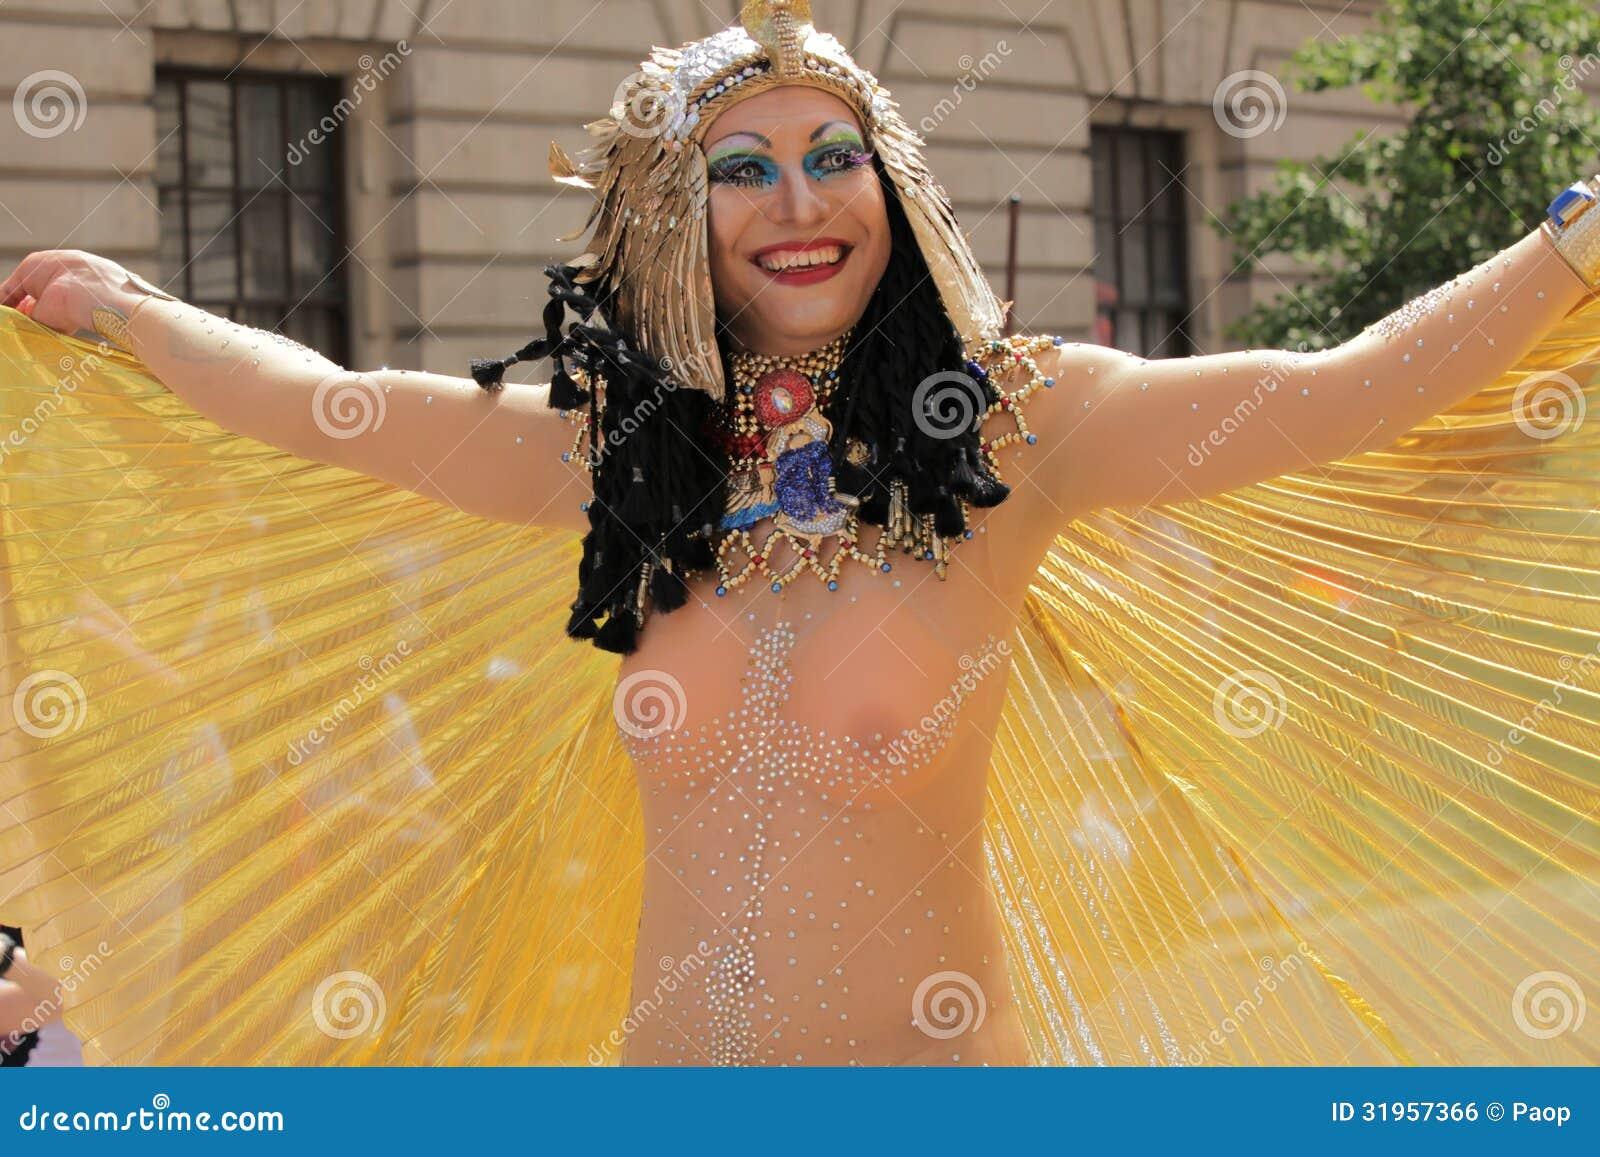 gay pharaoh editorial photo image of gold england crown